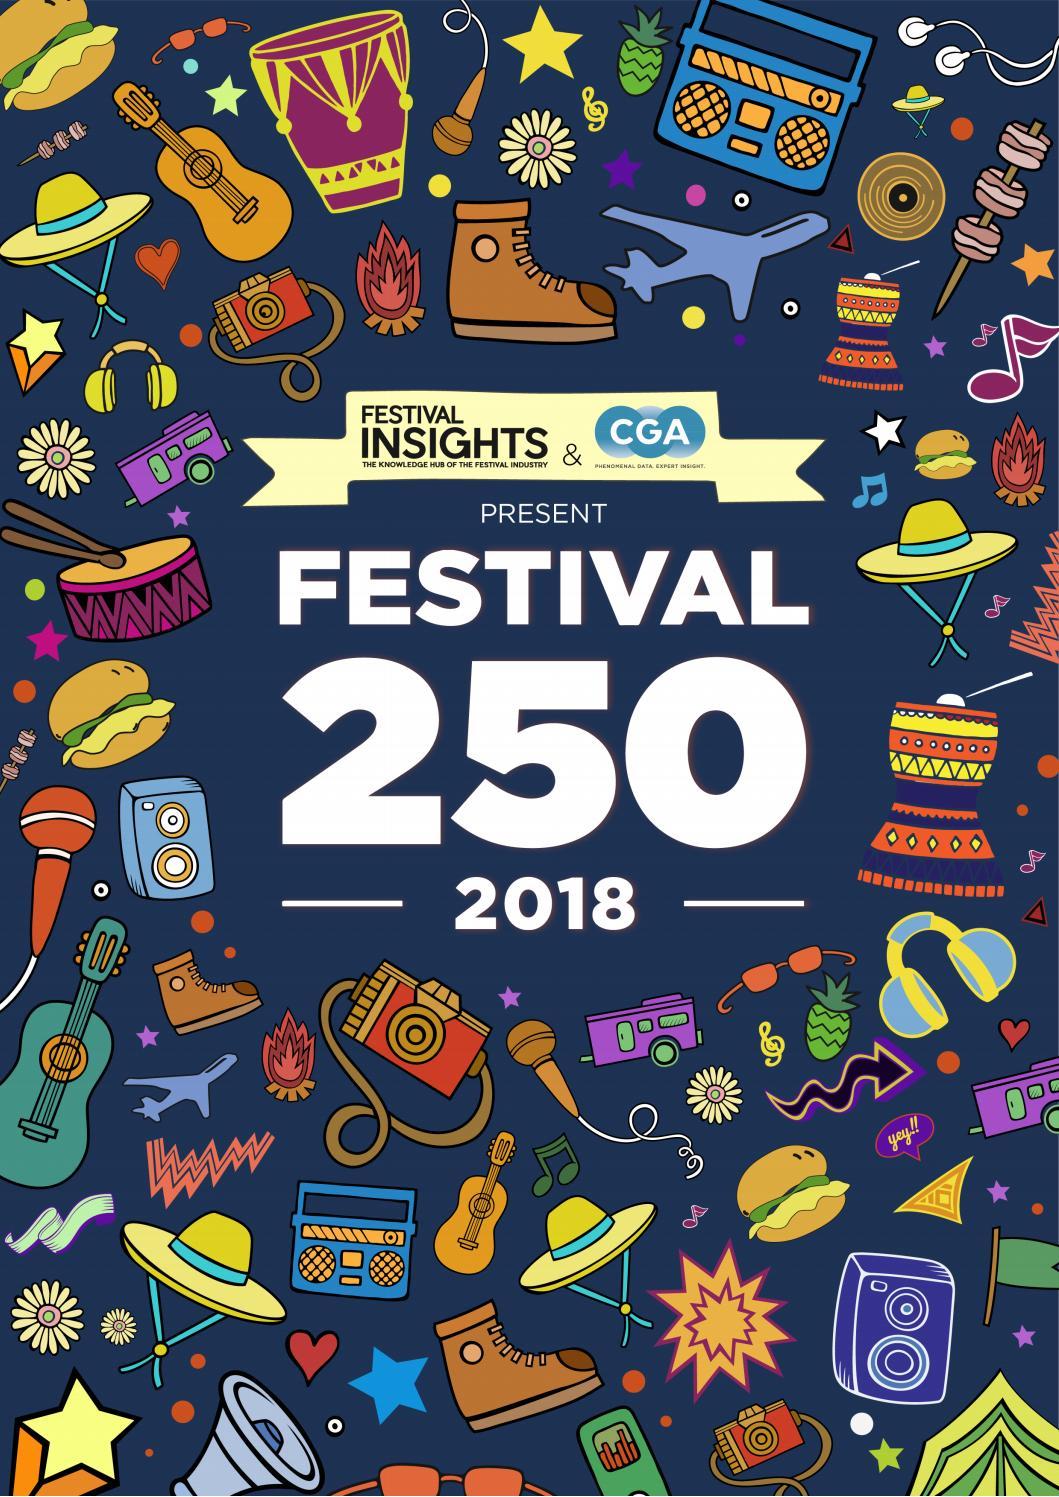 Festival 250 2018 by Mondiale Media.